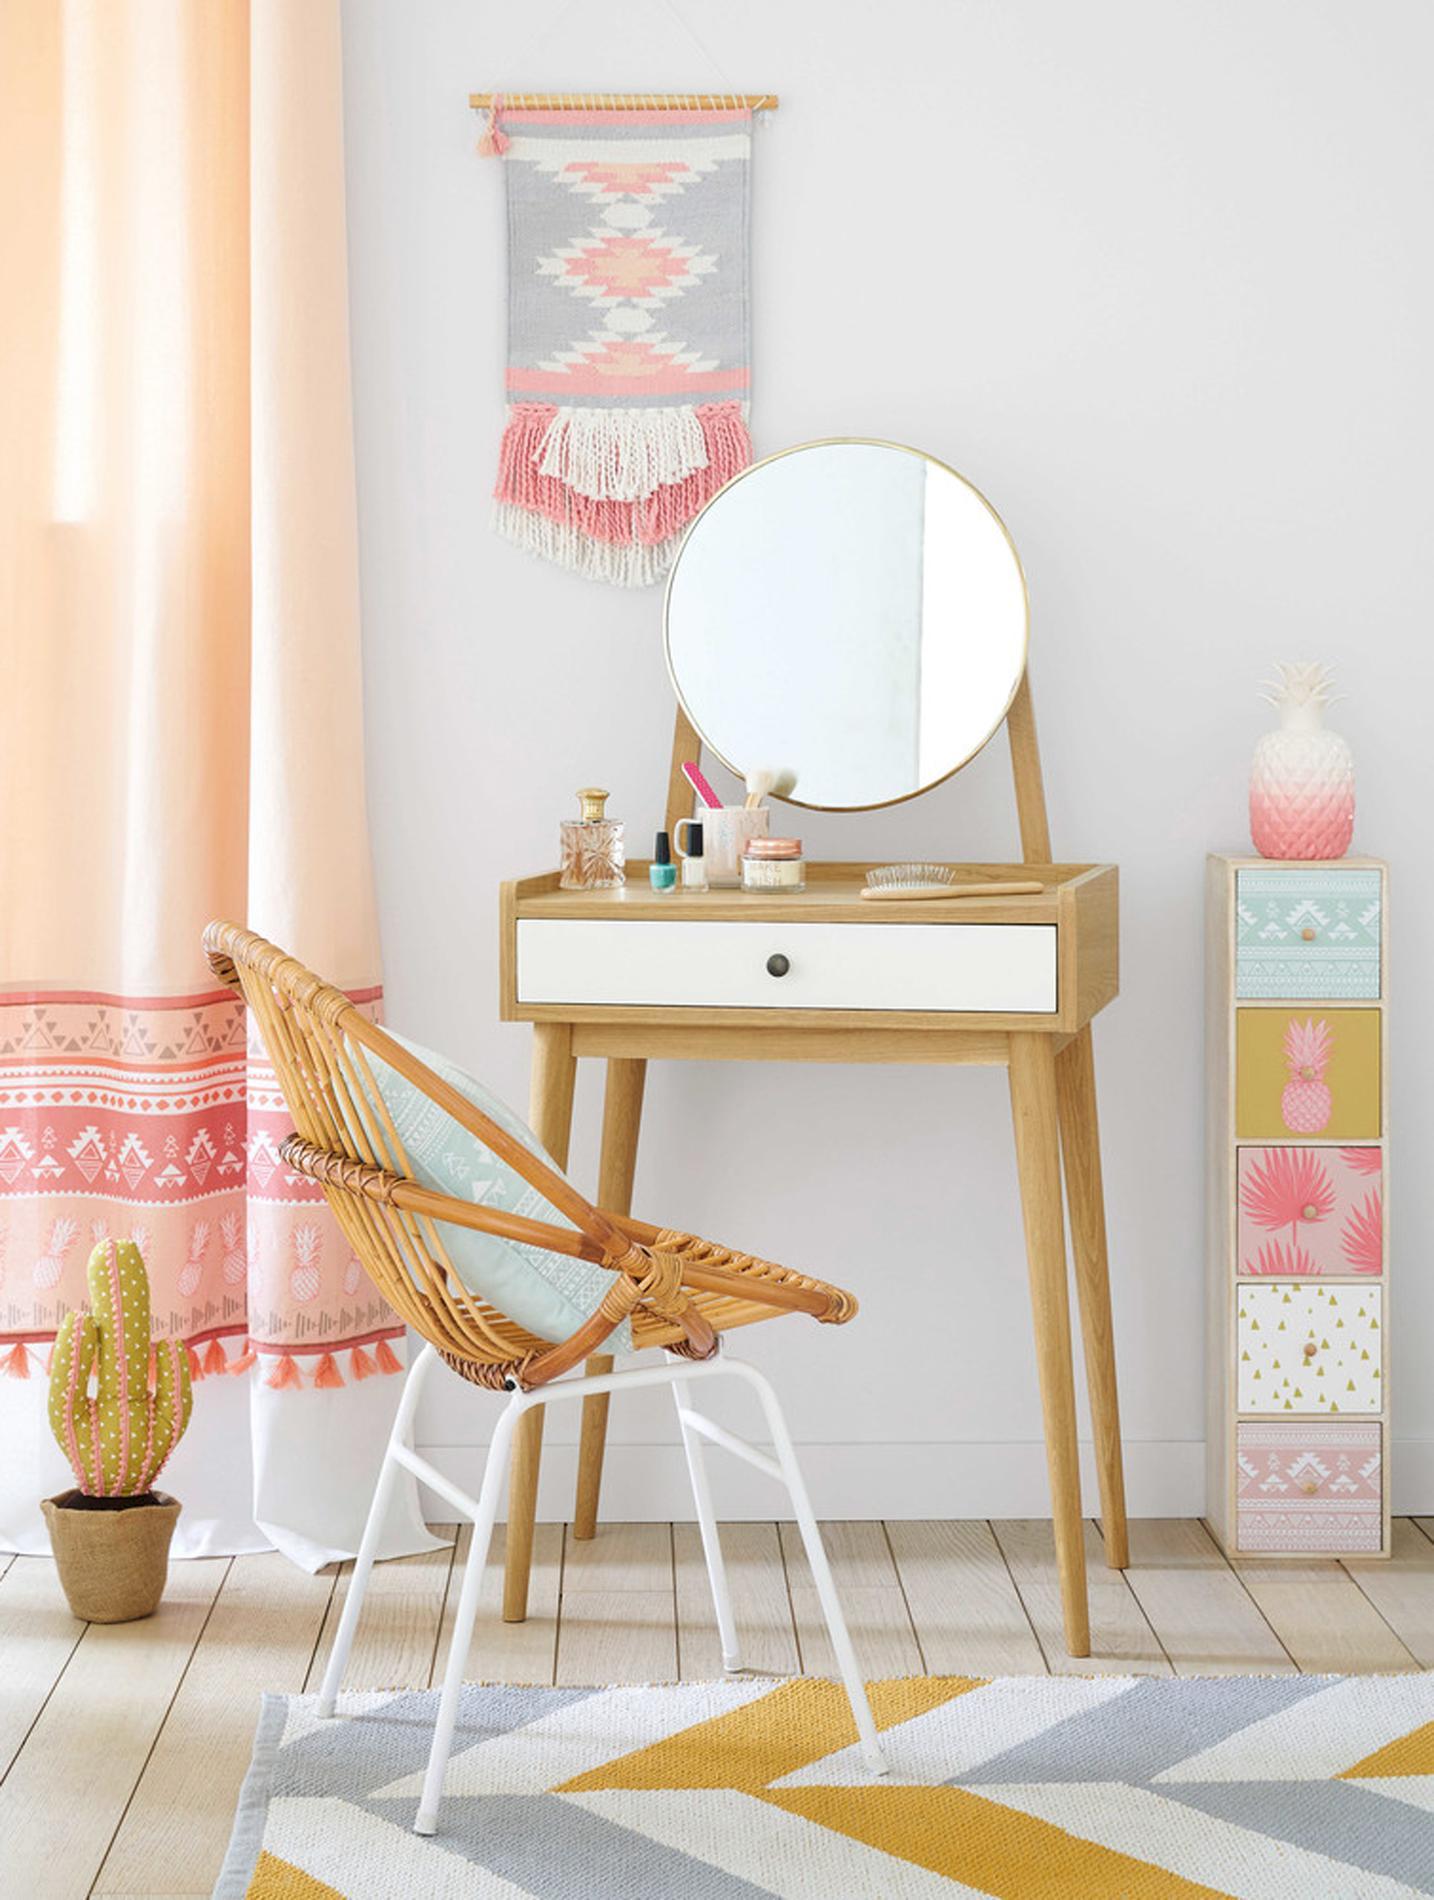 deco chambre maison du monde best awesome chambre orientale deco images matkin info matkin info. Black Bedroom Furniture Sets. Home Design Ideas